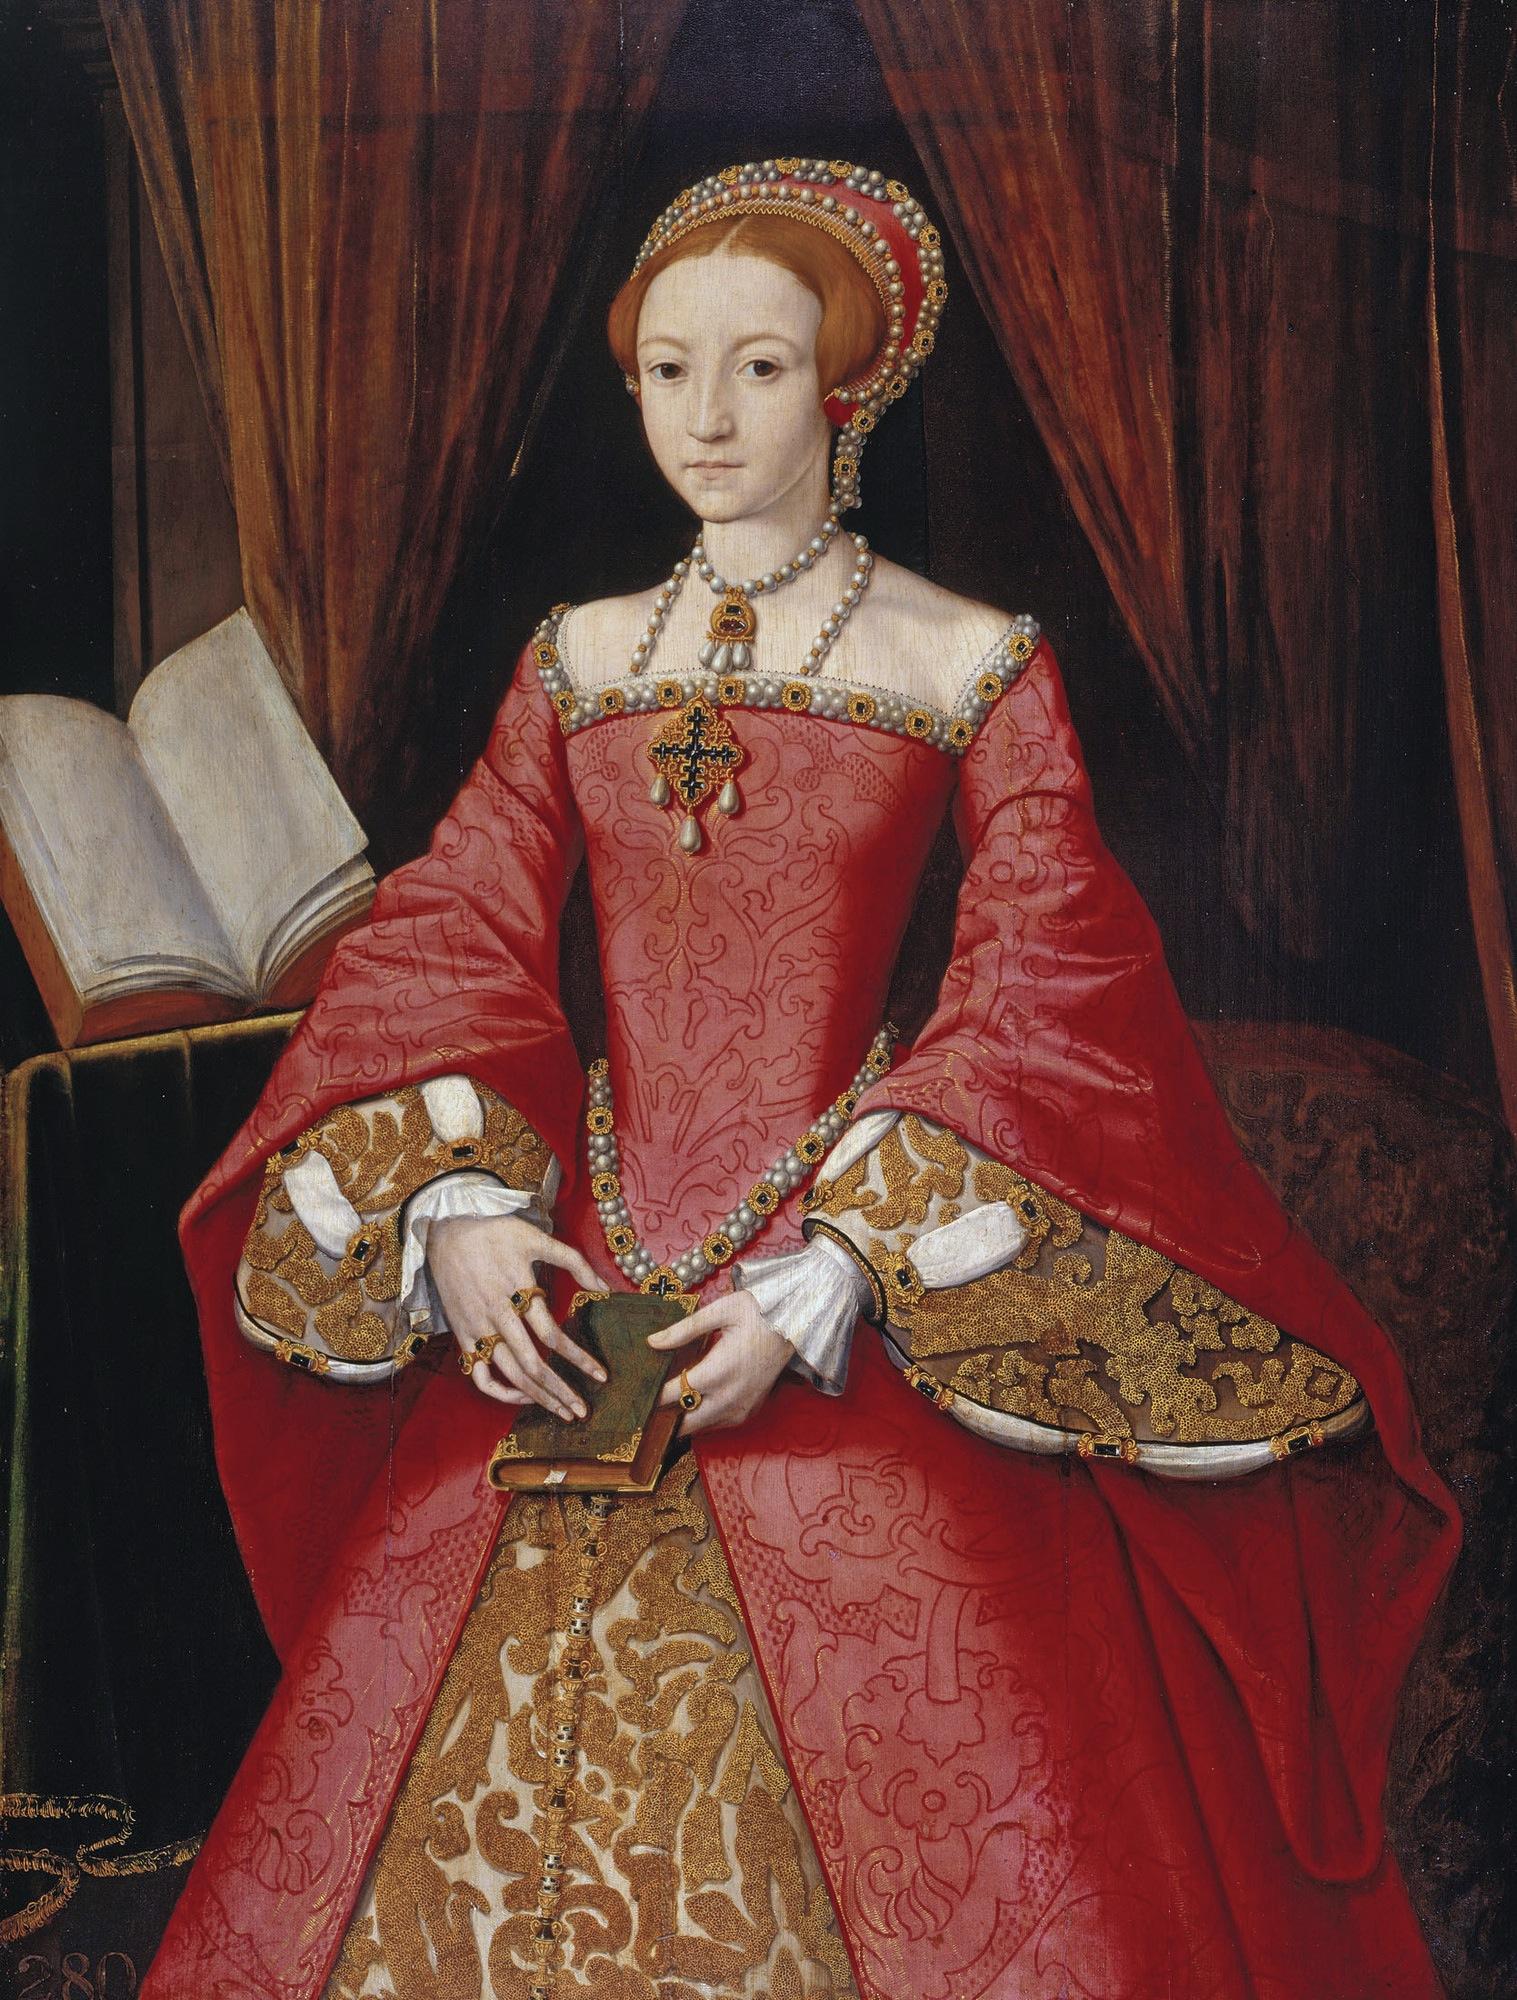 Elizabeth, the daughter of Henry and Anne Boleyn, the future Queen Elizabeth I.